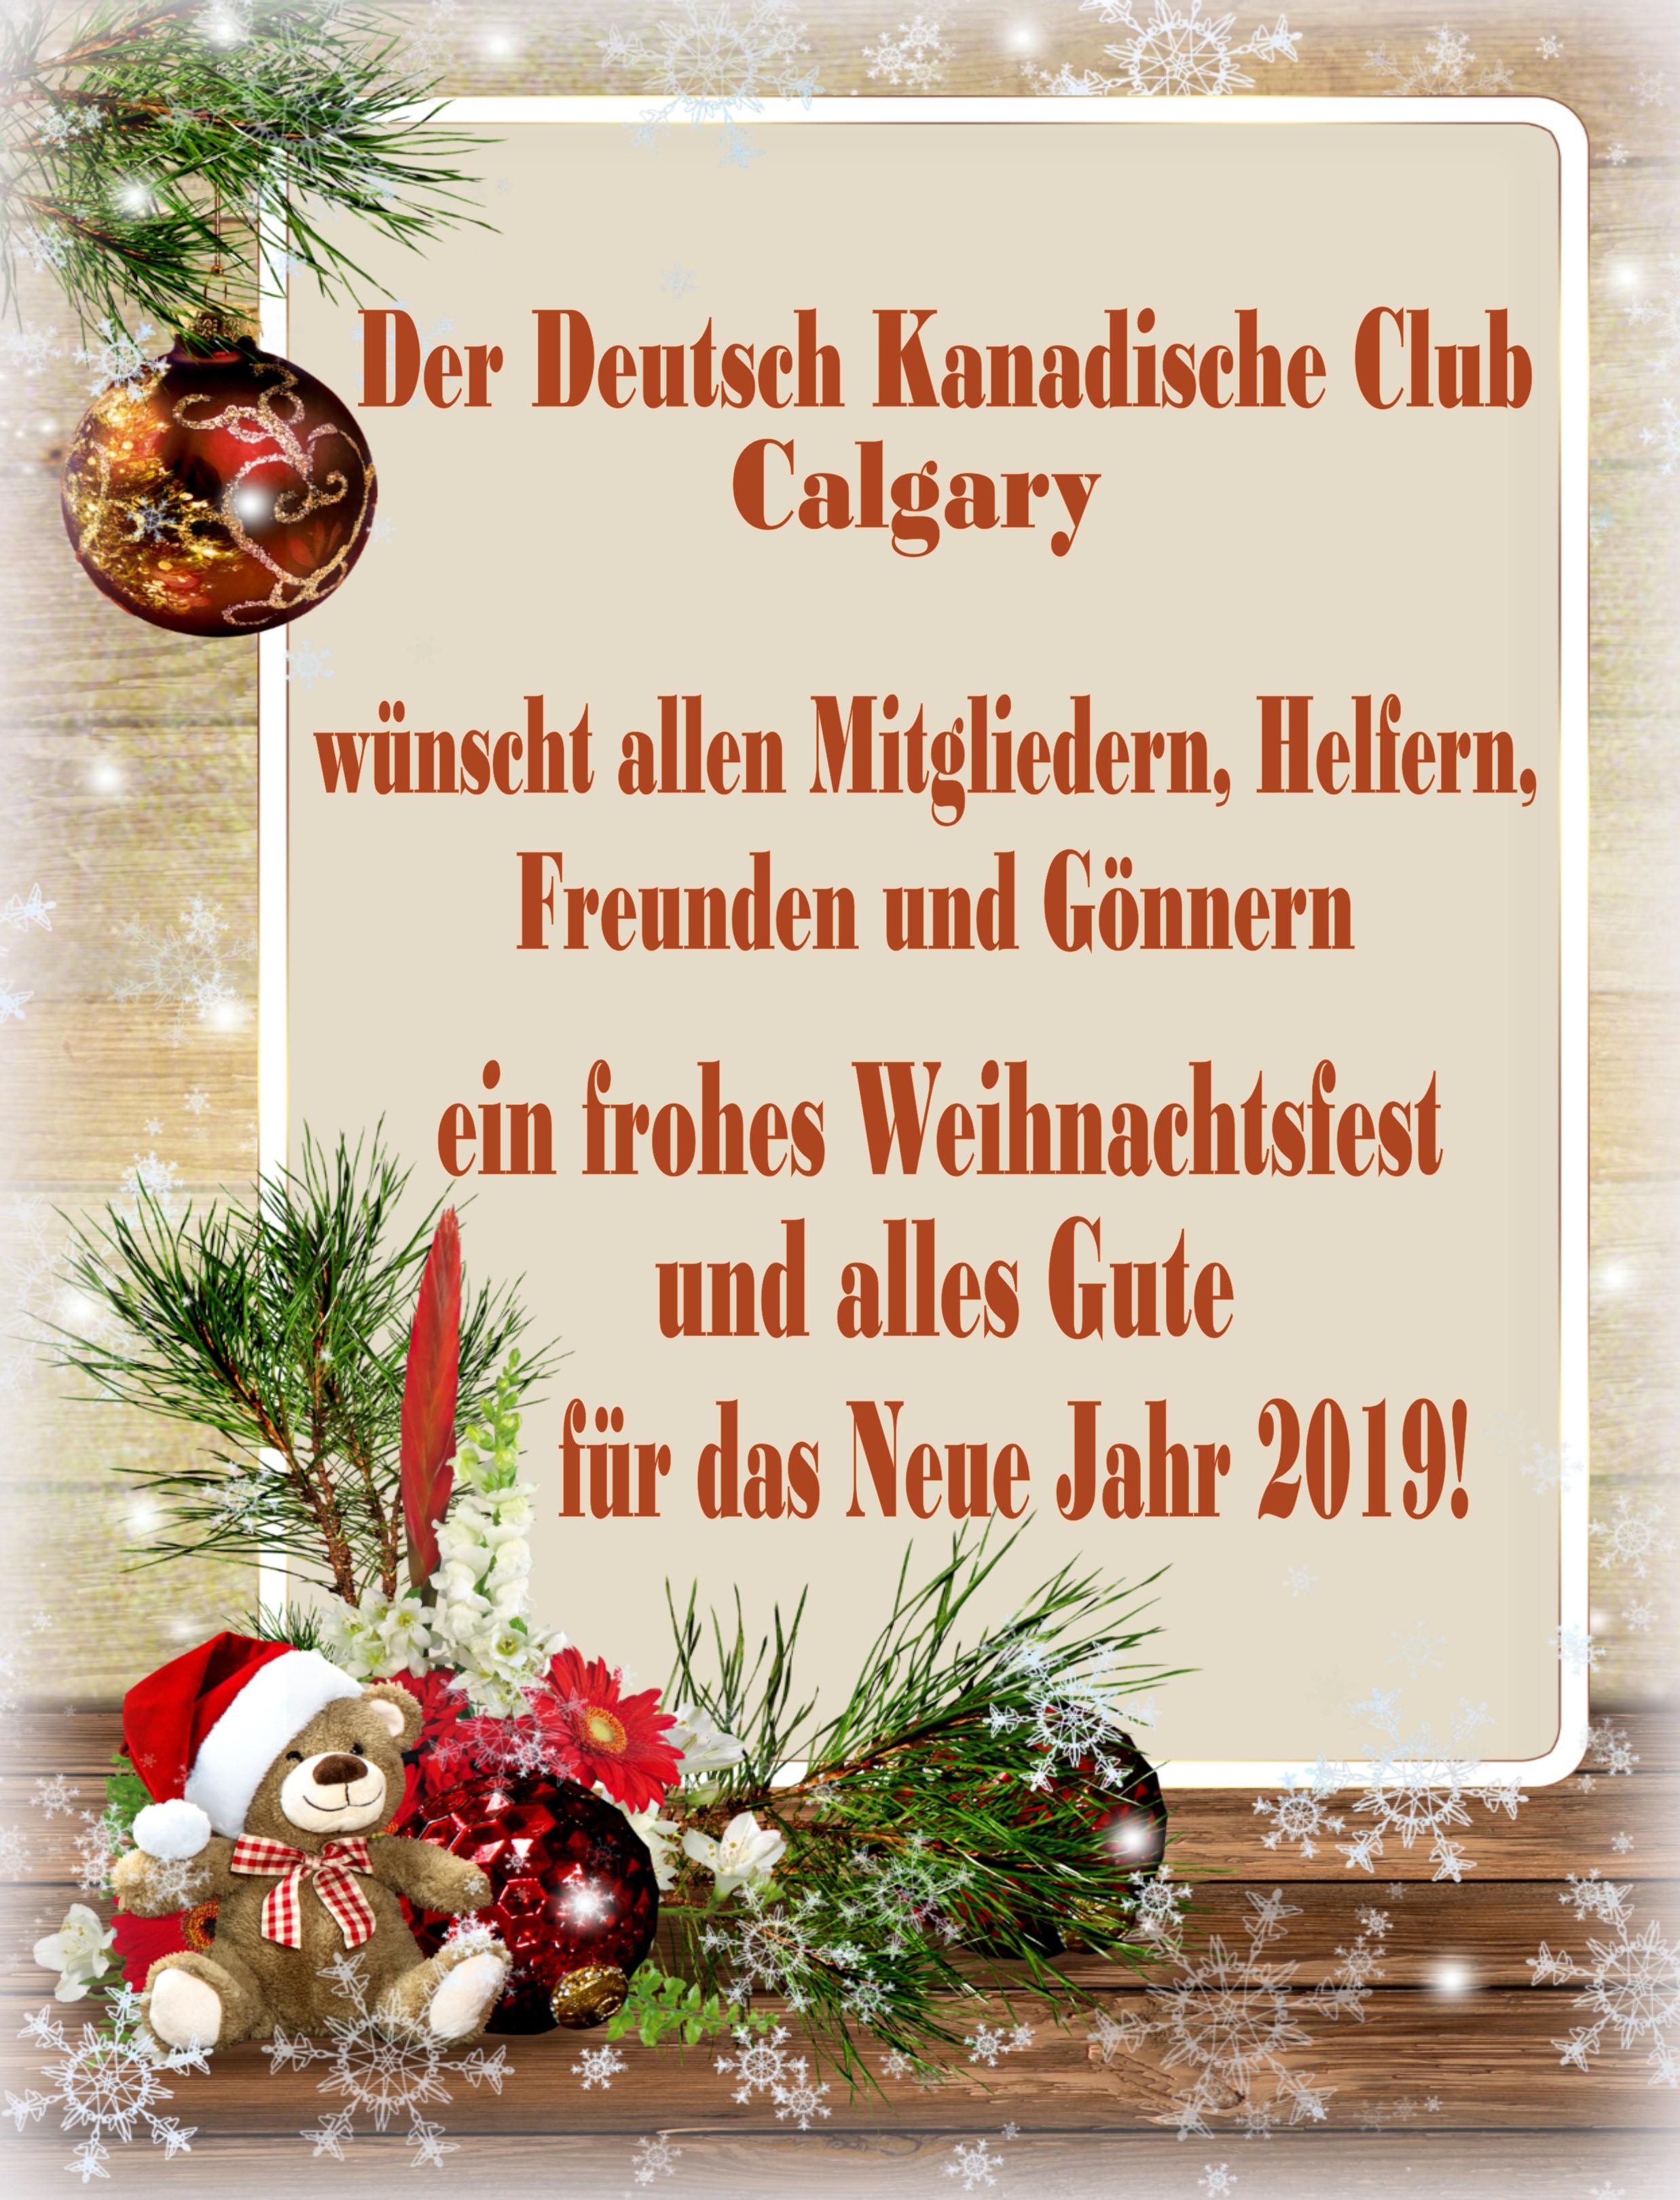 Weihnachtsgrüße Deutsch.Weihnachtsgruß Club Rot German Canadian Club Of Calgary